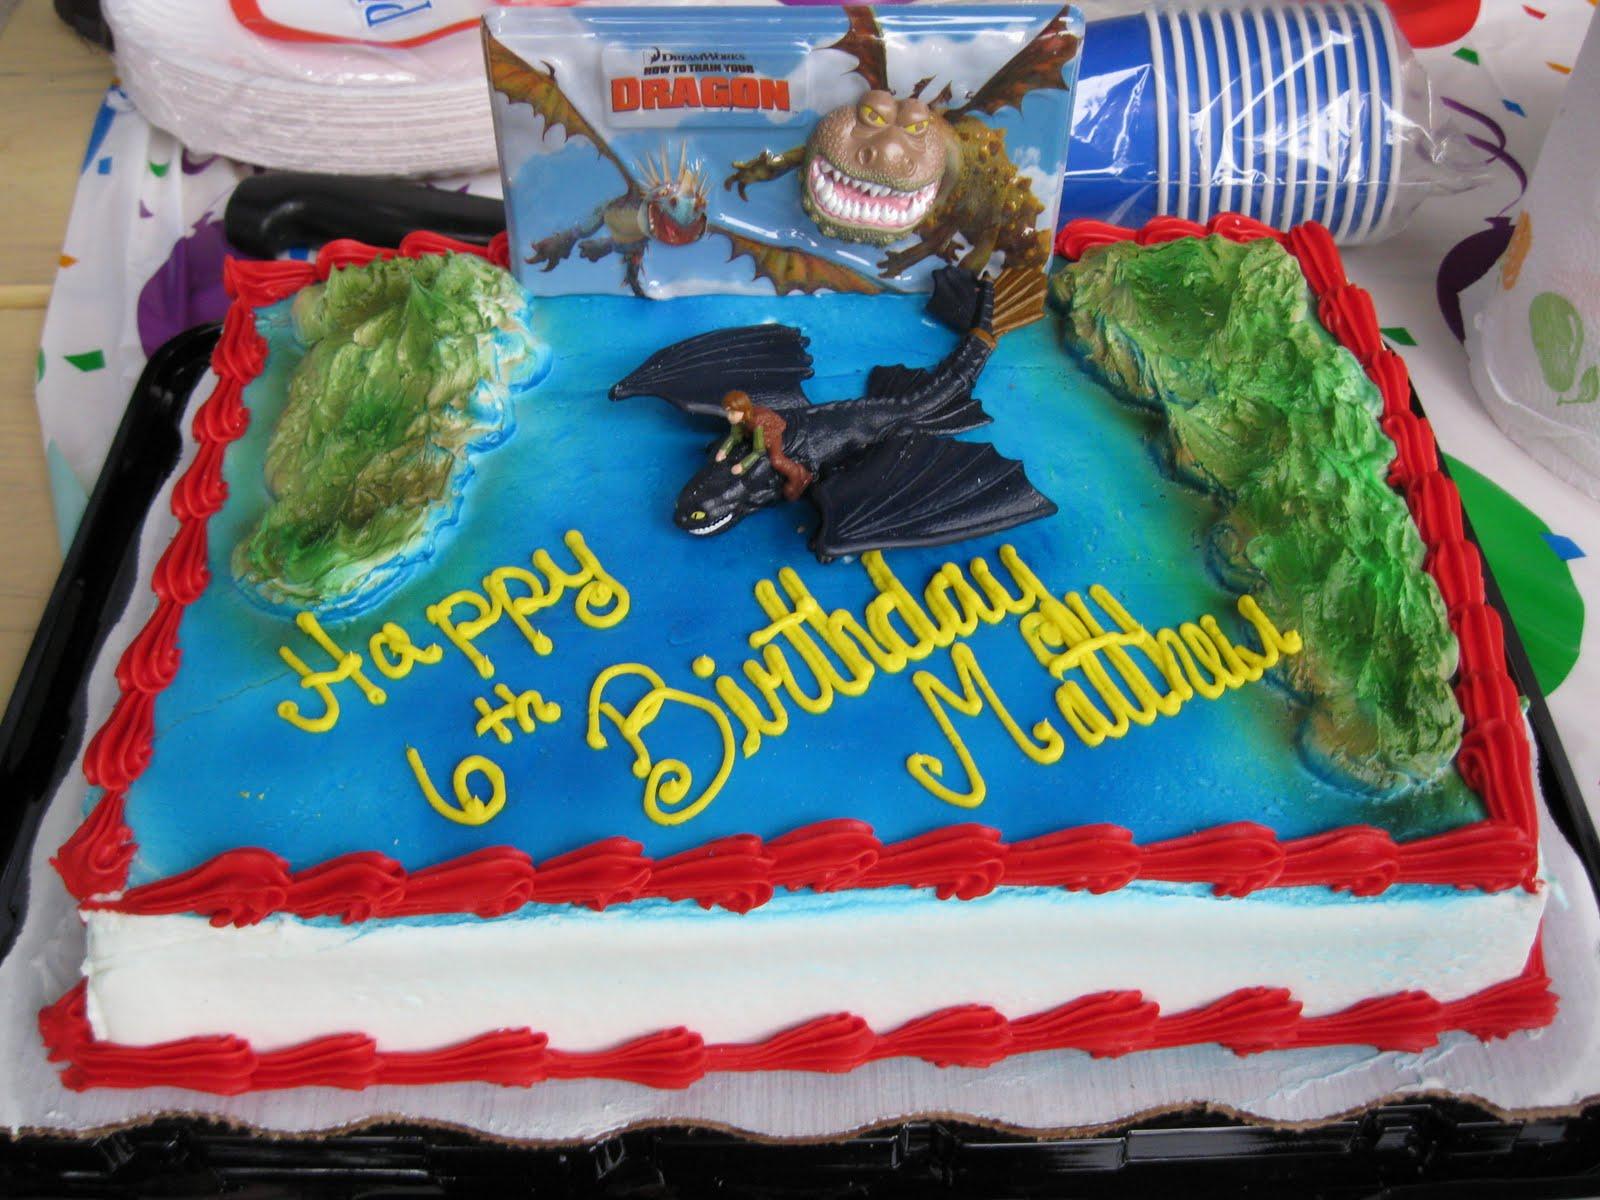 Bowman family matthews 6th birthday matthews 6th birthday ccuart Choice Image